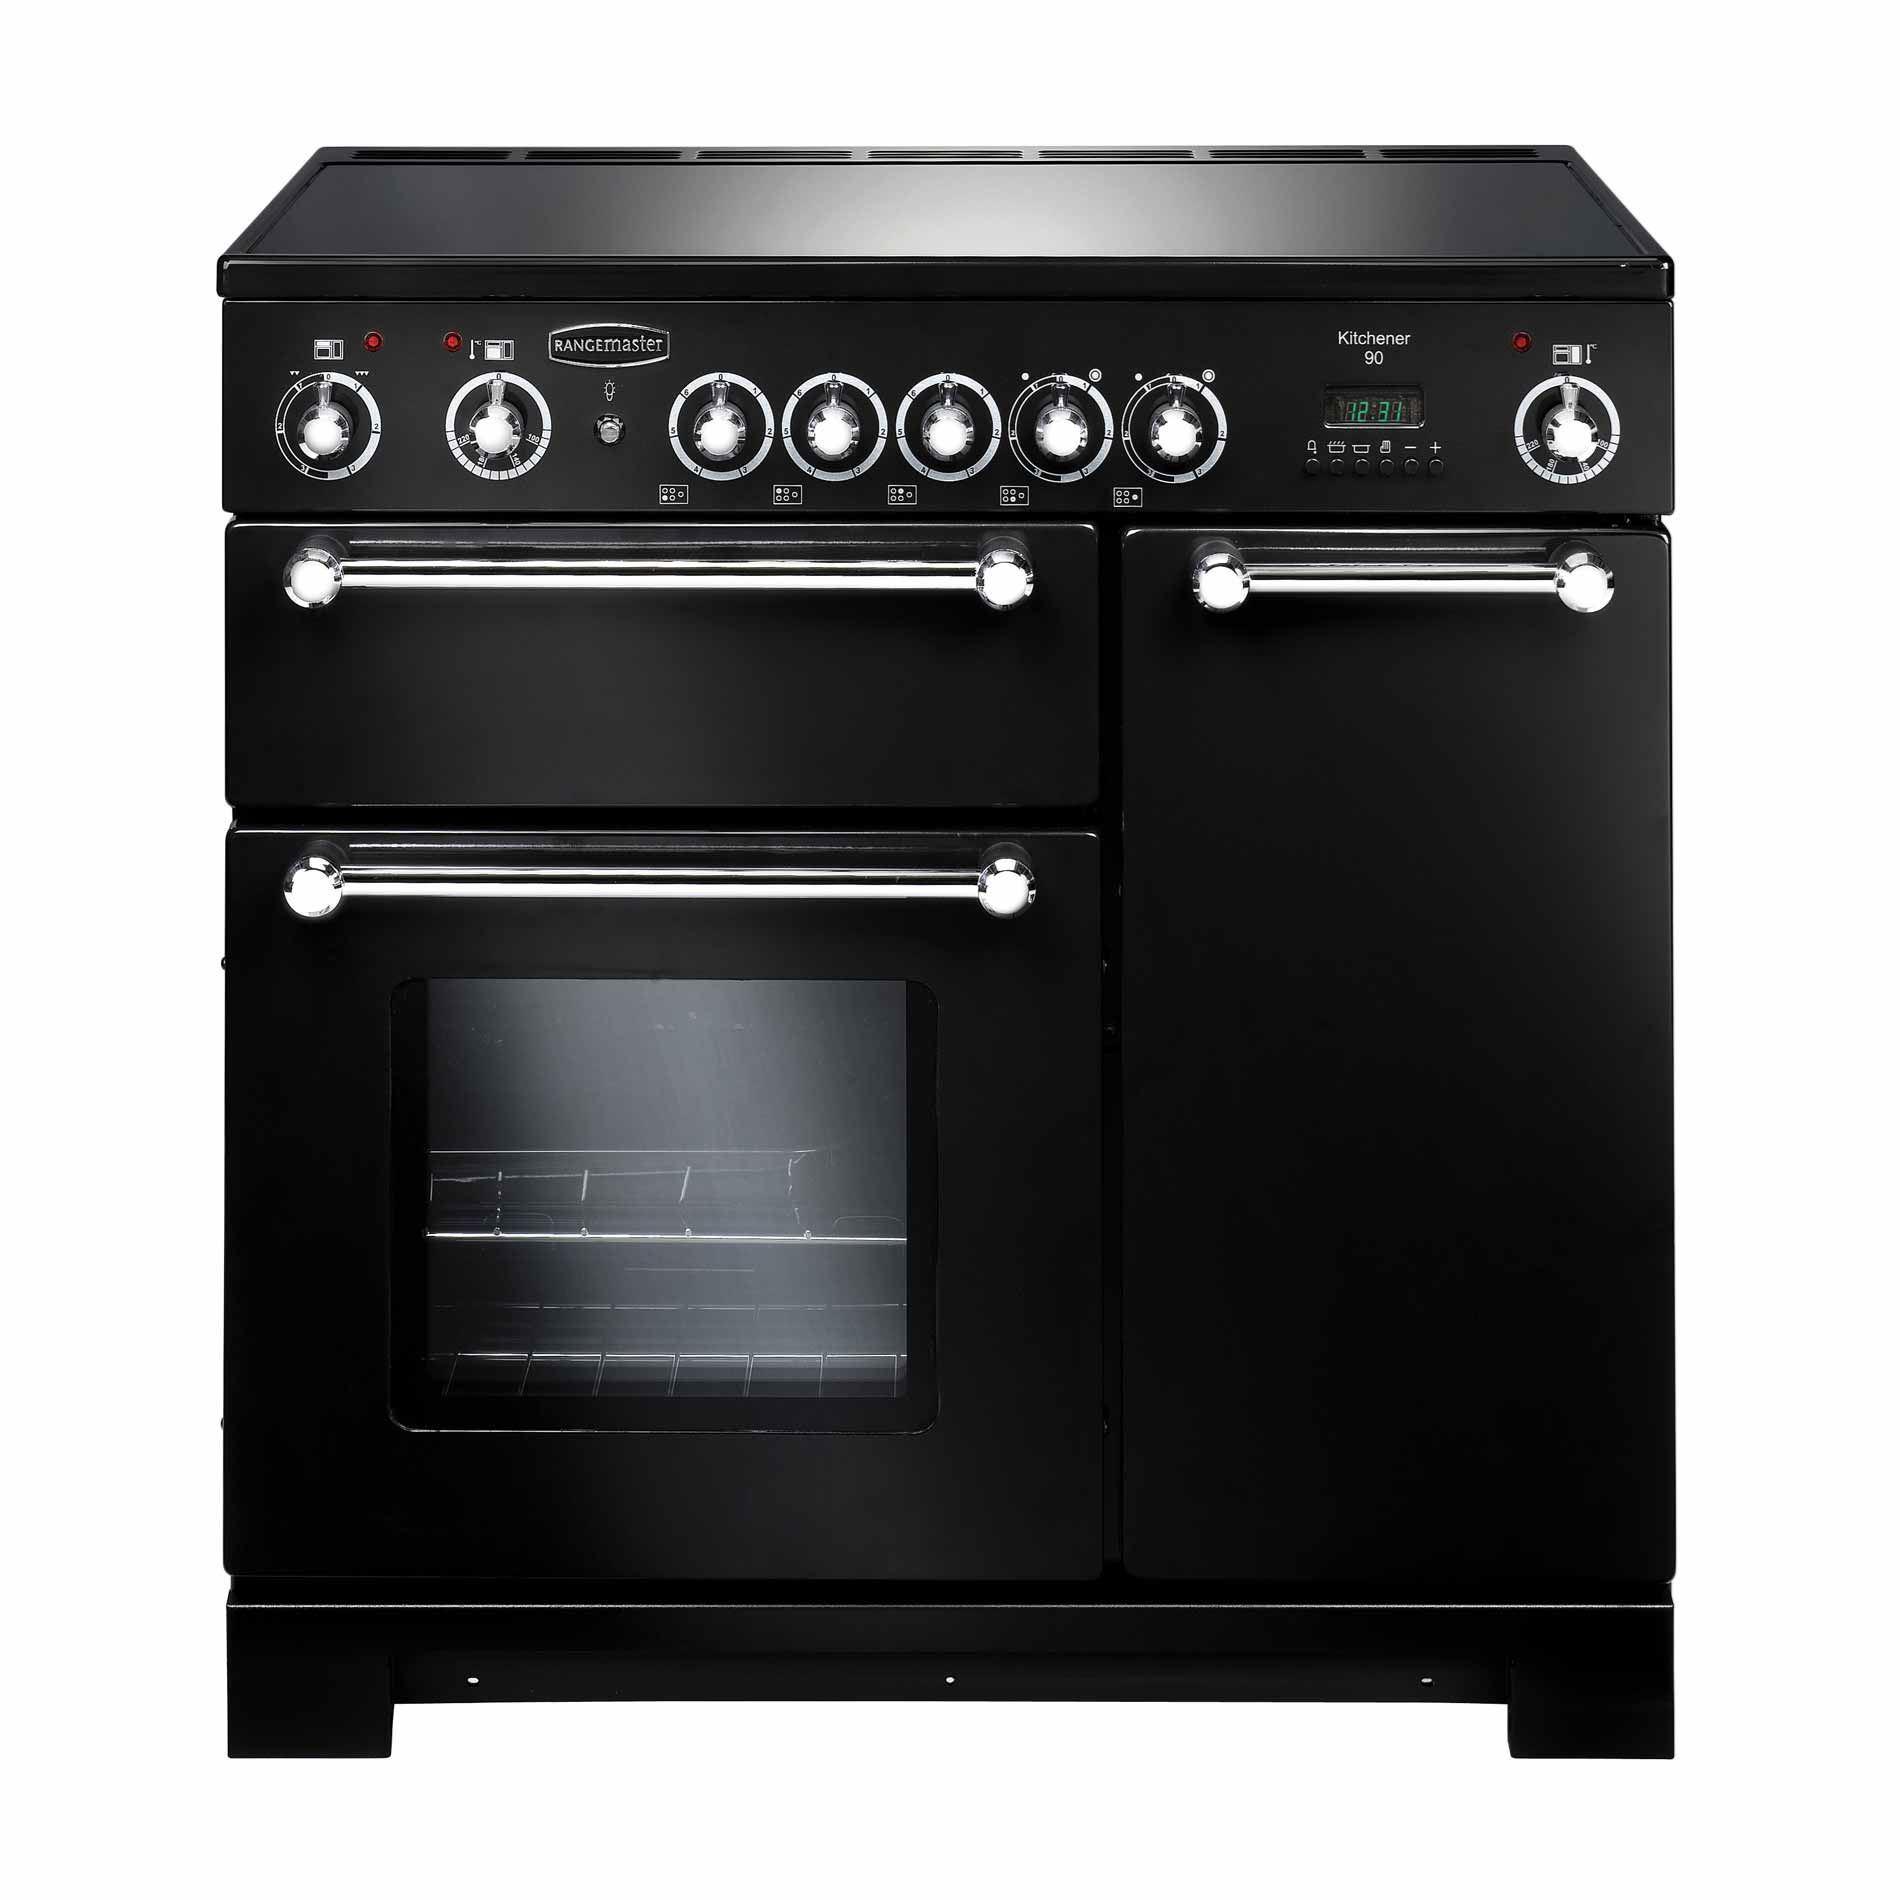 Uncategorized Appliance Kitchener rangemaster kitchener 90 ceramic black range cooker appliance picture of cooker